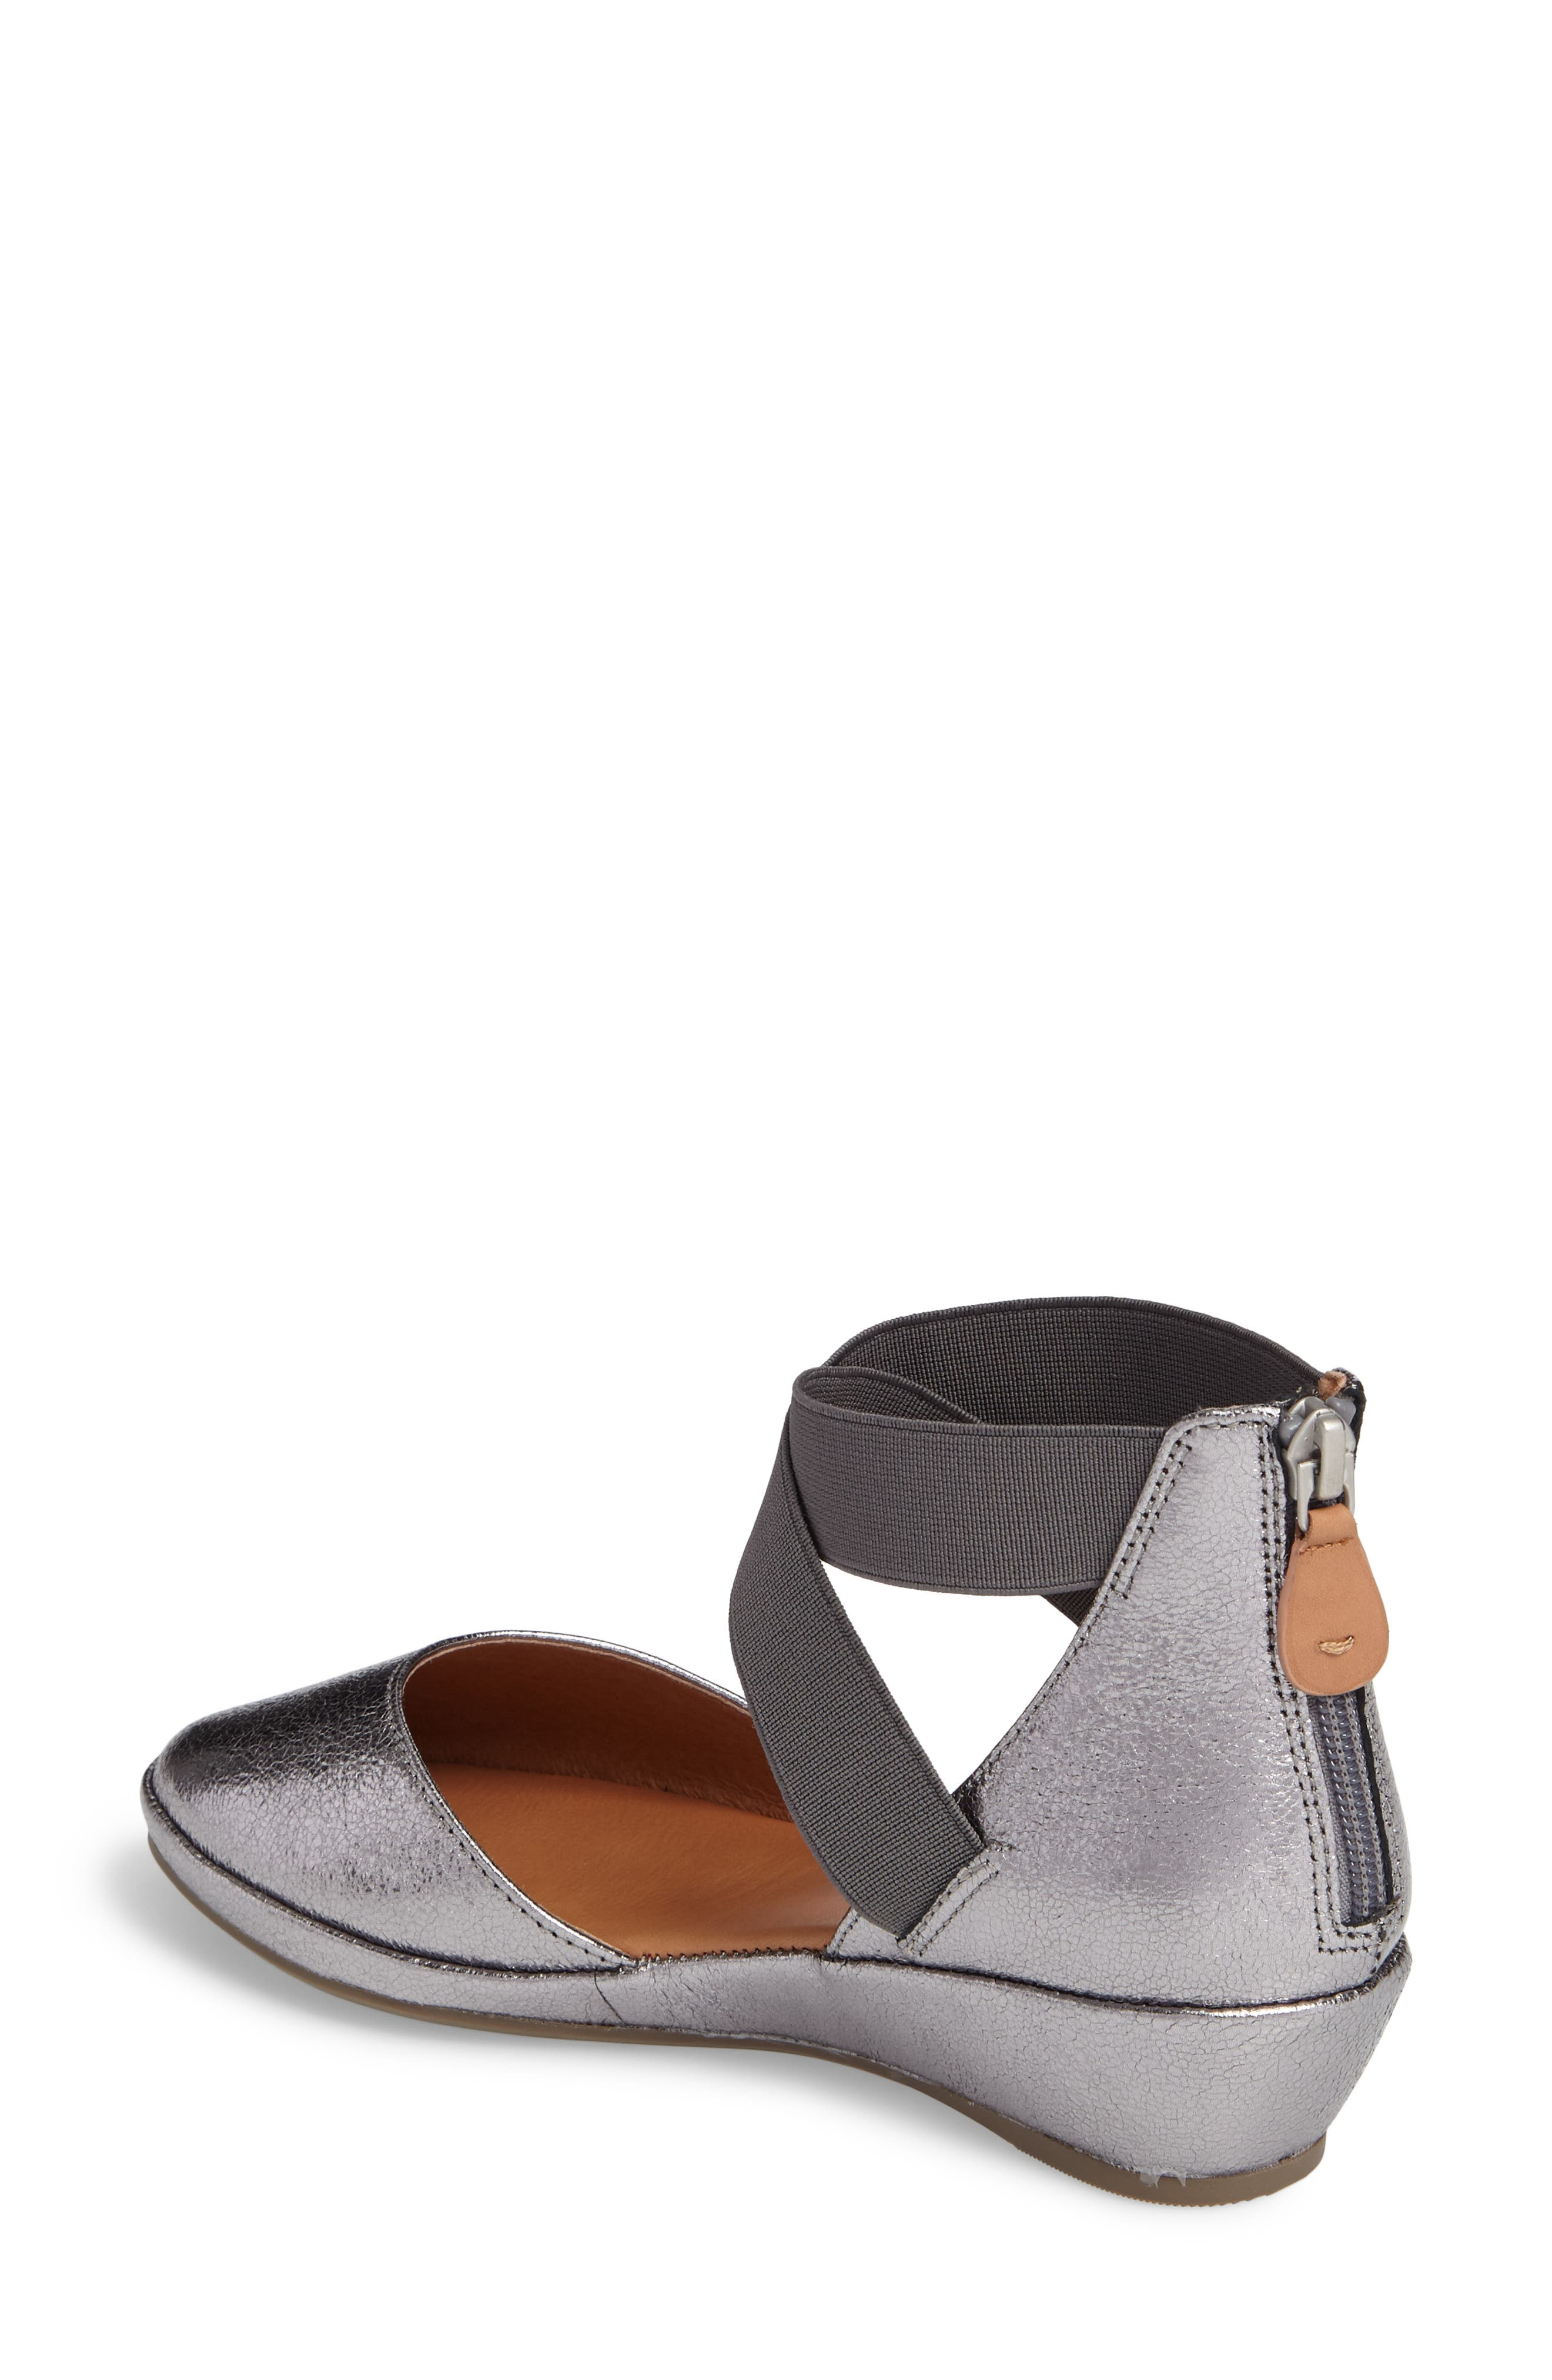 3331aa13357b Women s Sandals